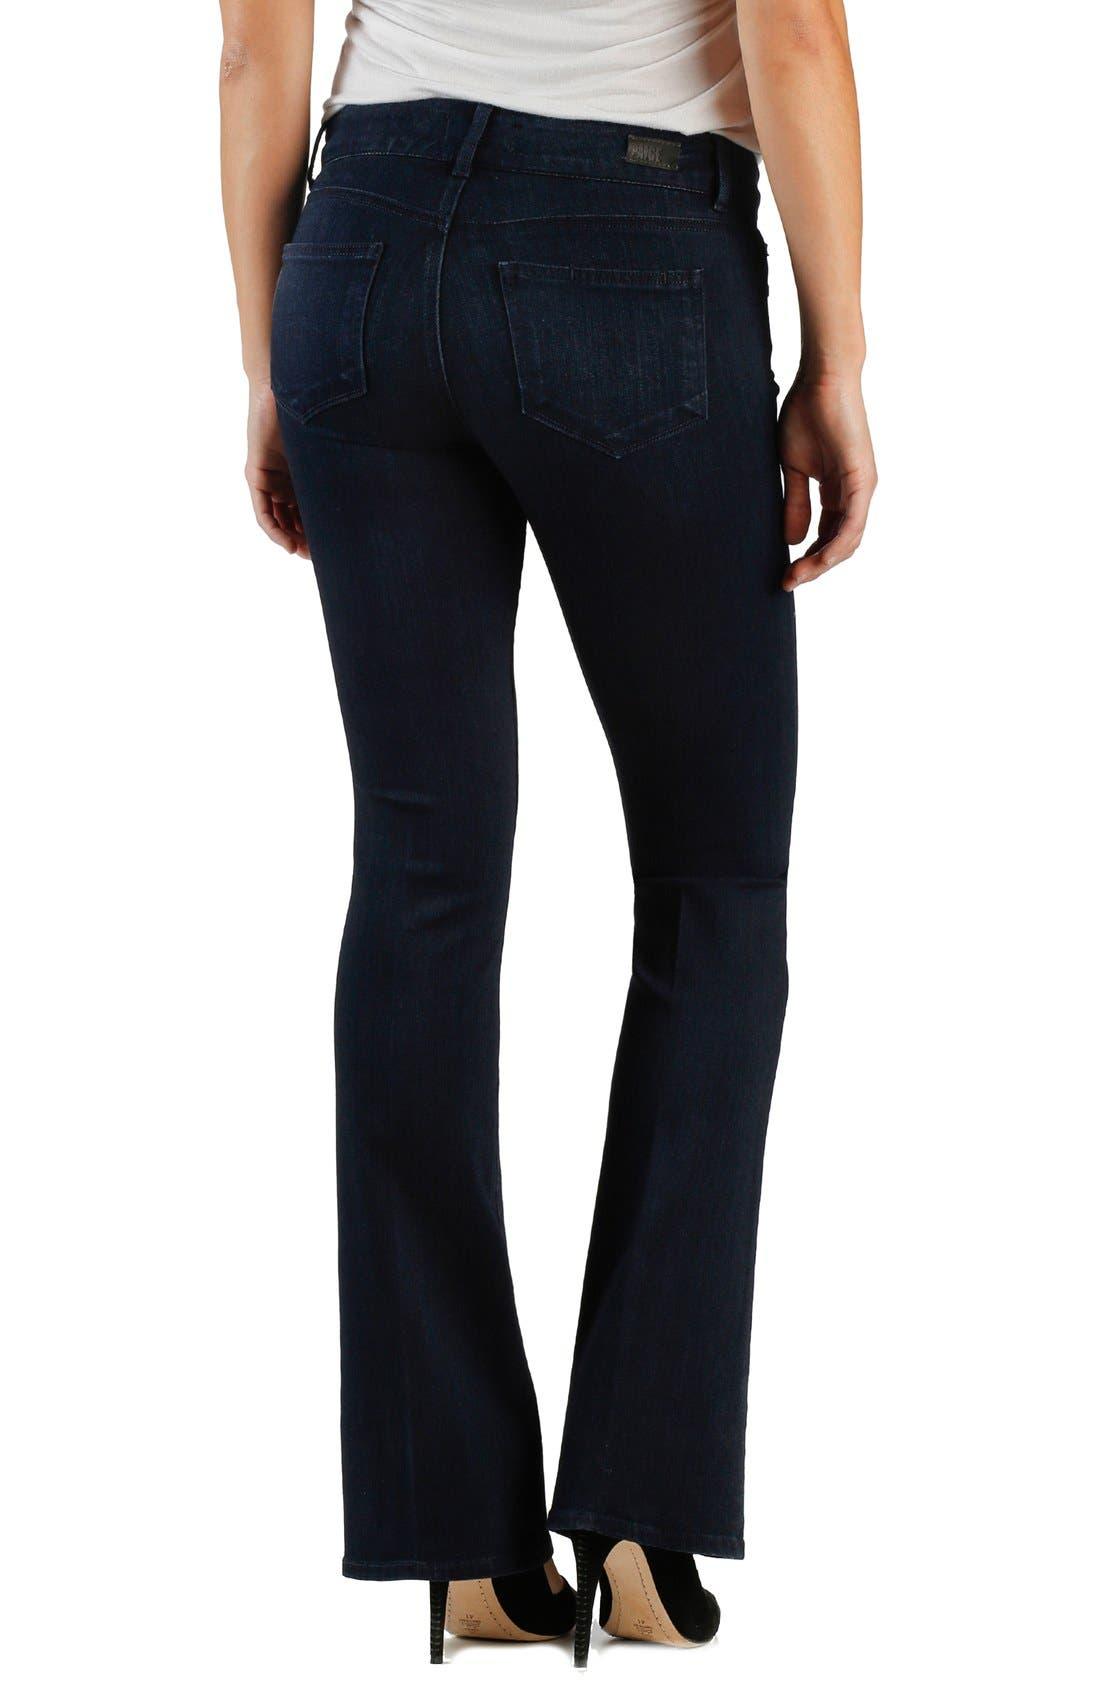 Alternate Image 2  - PAIGE 'Transcend - Hidden Hills' Bootcut Jeans (Bette)